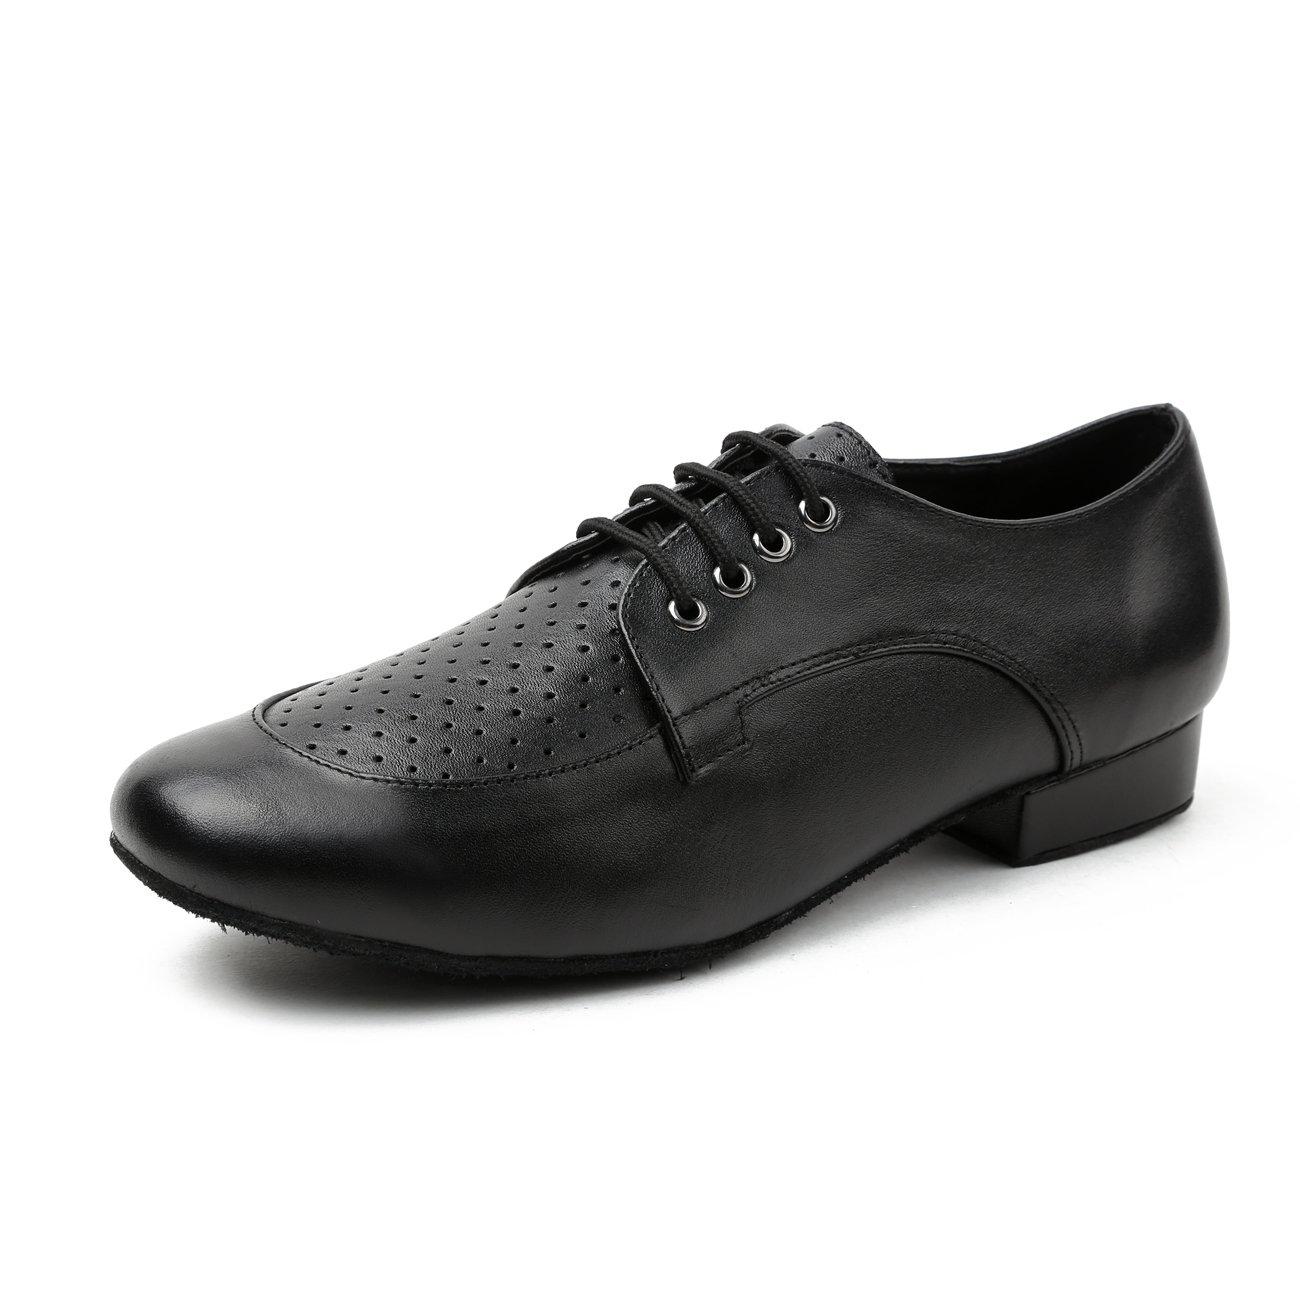 Minishion Boy's Men's Breathable Black Leather Latin Salsa Ballroom Dancing Shoes Formal Dress Shoes US 9.5